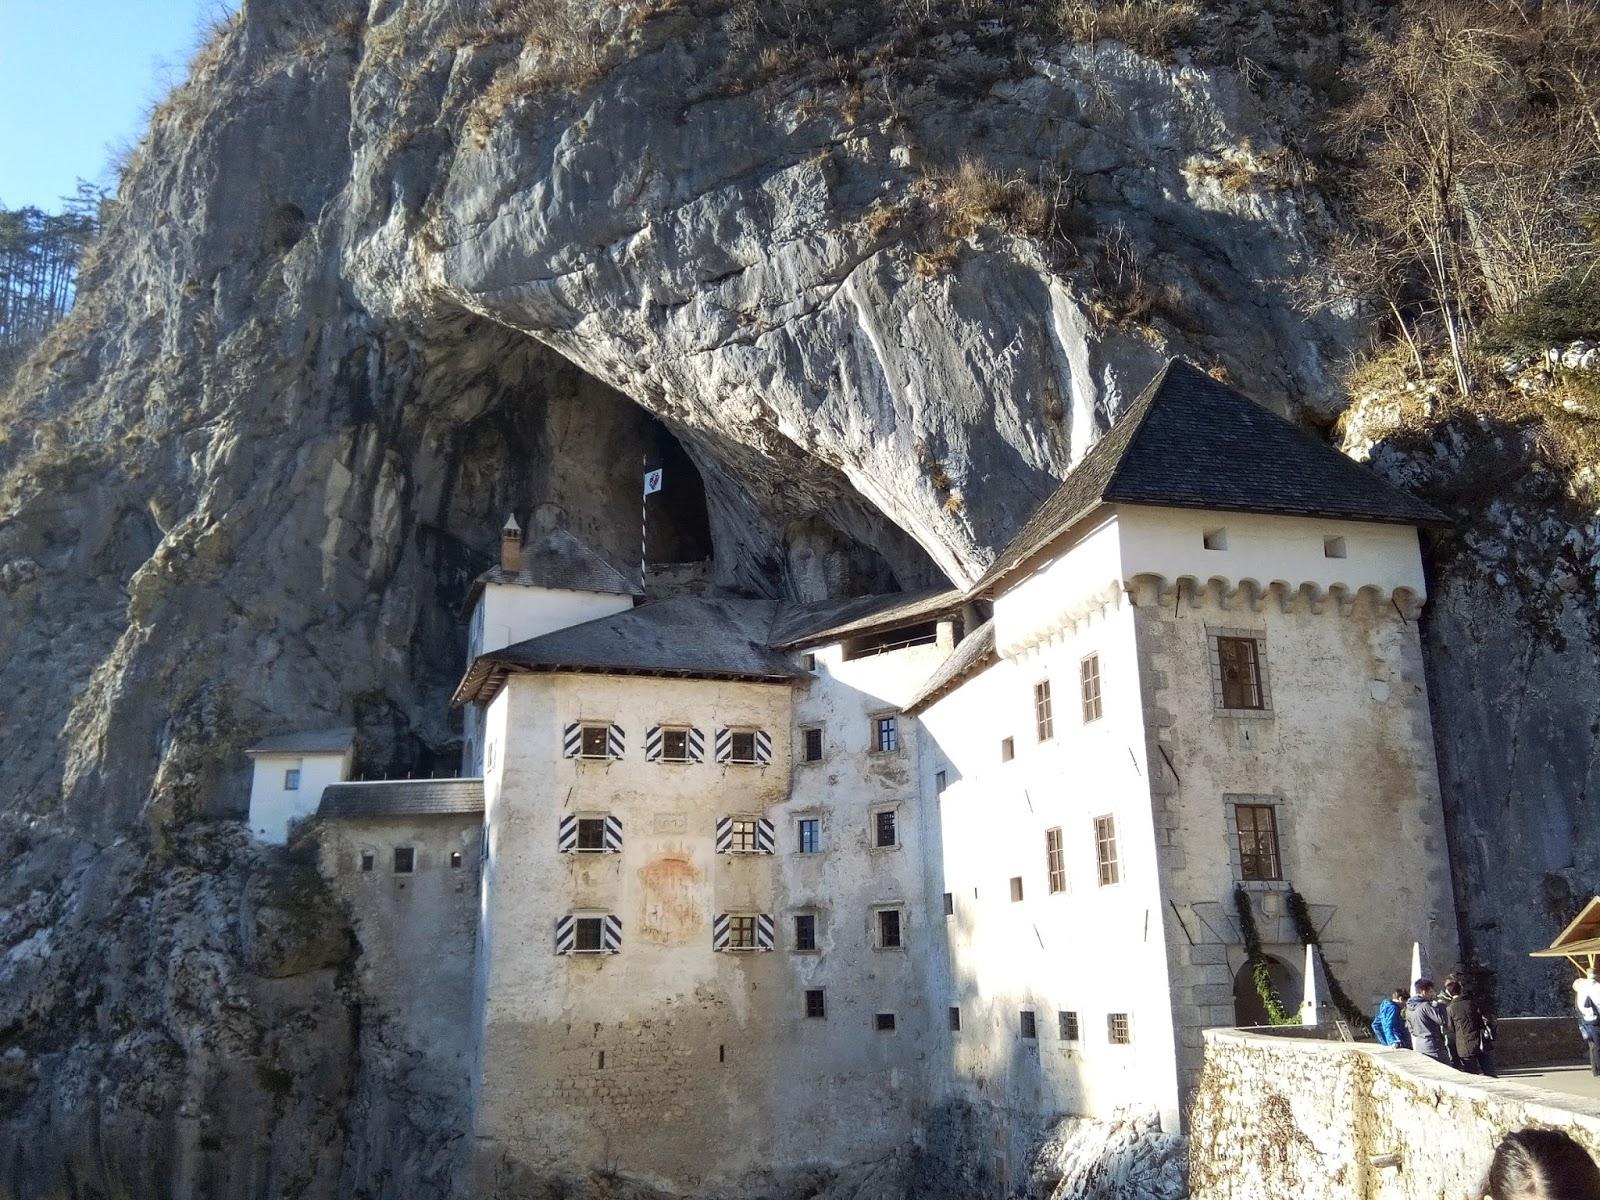 guida turistica slovenia pdf gratis